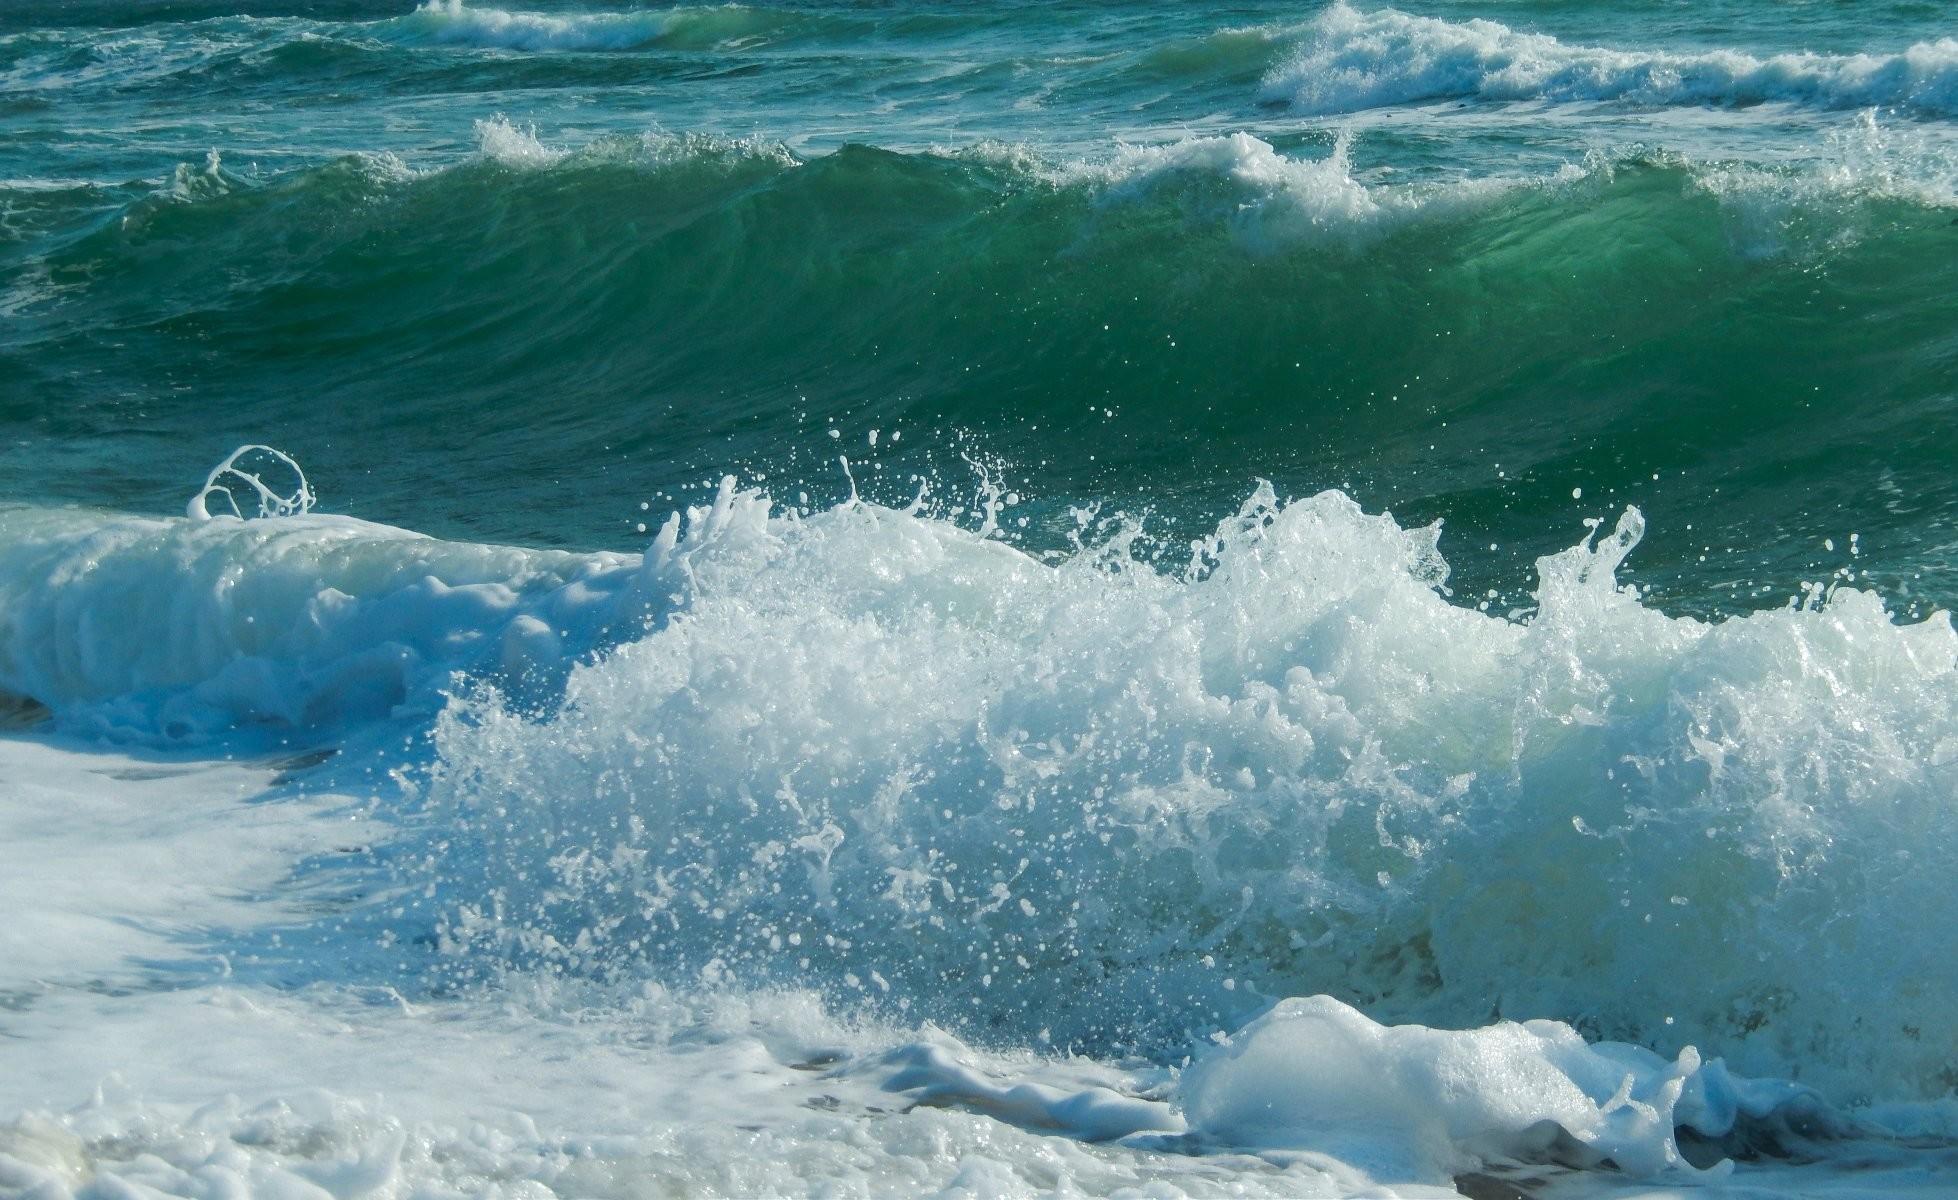 sea waves sea widescreen full screen widescreen hd wallpapers background  wallpaper widescreen fullscreen widescreen desktop wallpaper